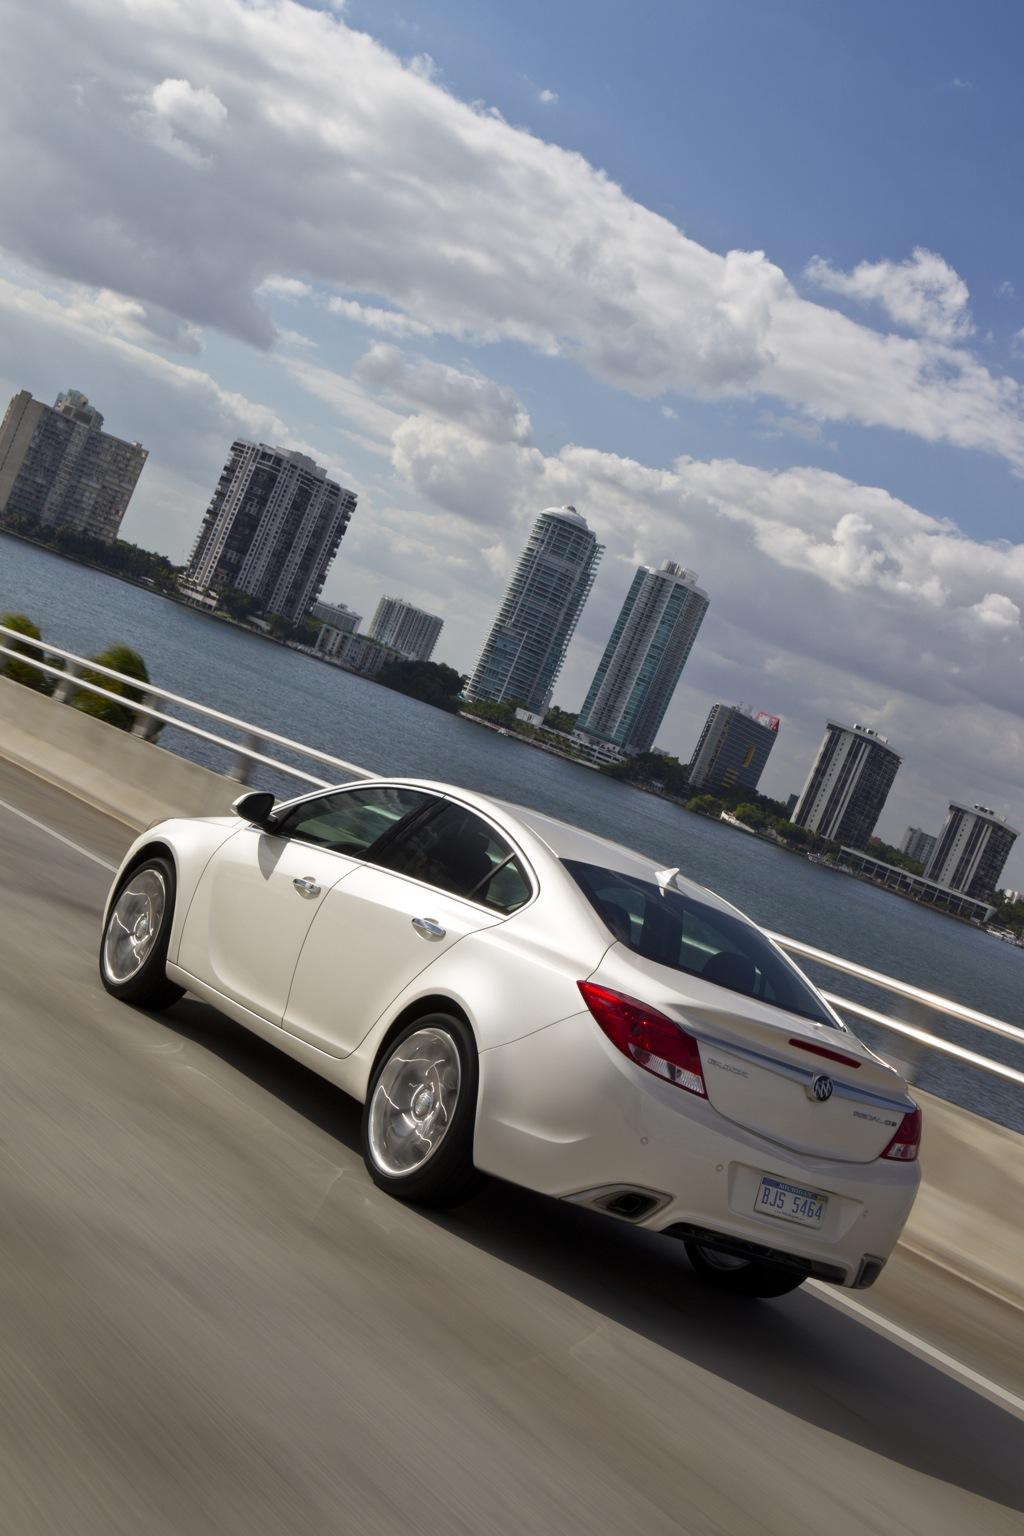 2012 Buick Regal Gs Pricing Announced Autoevolution